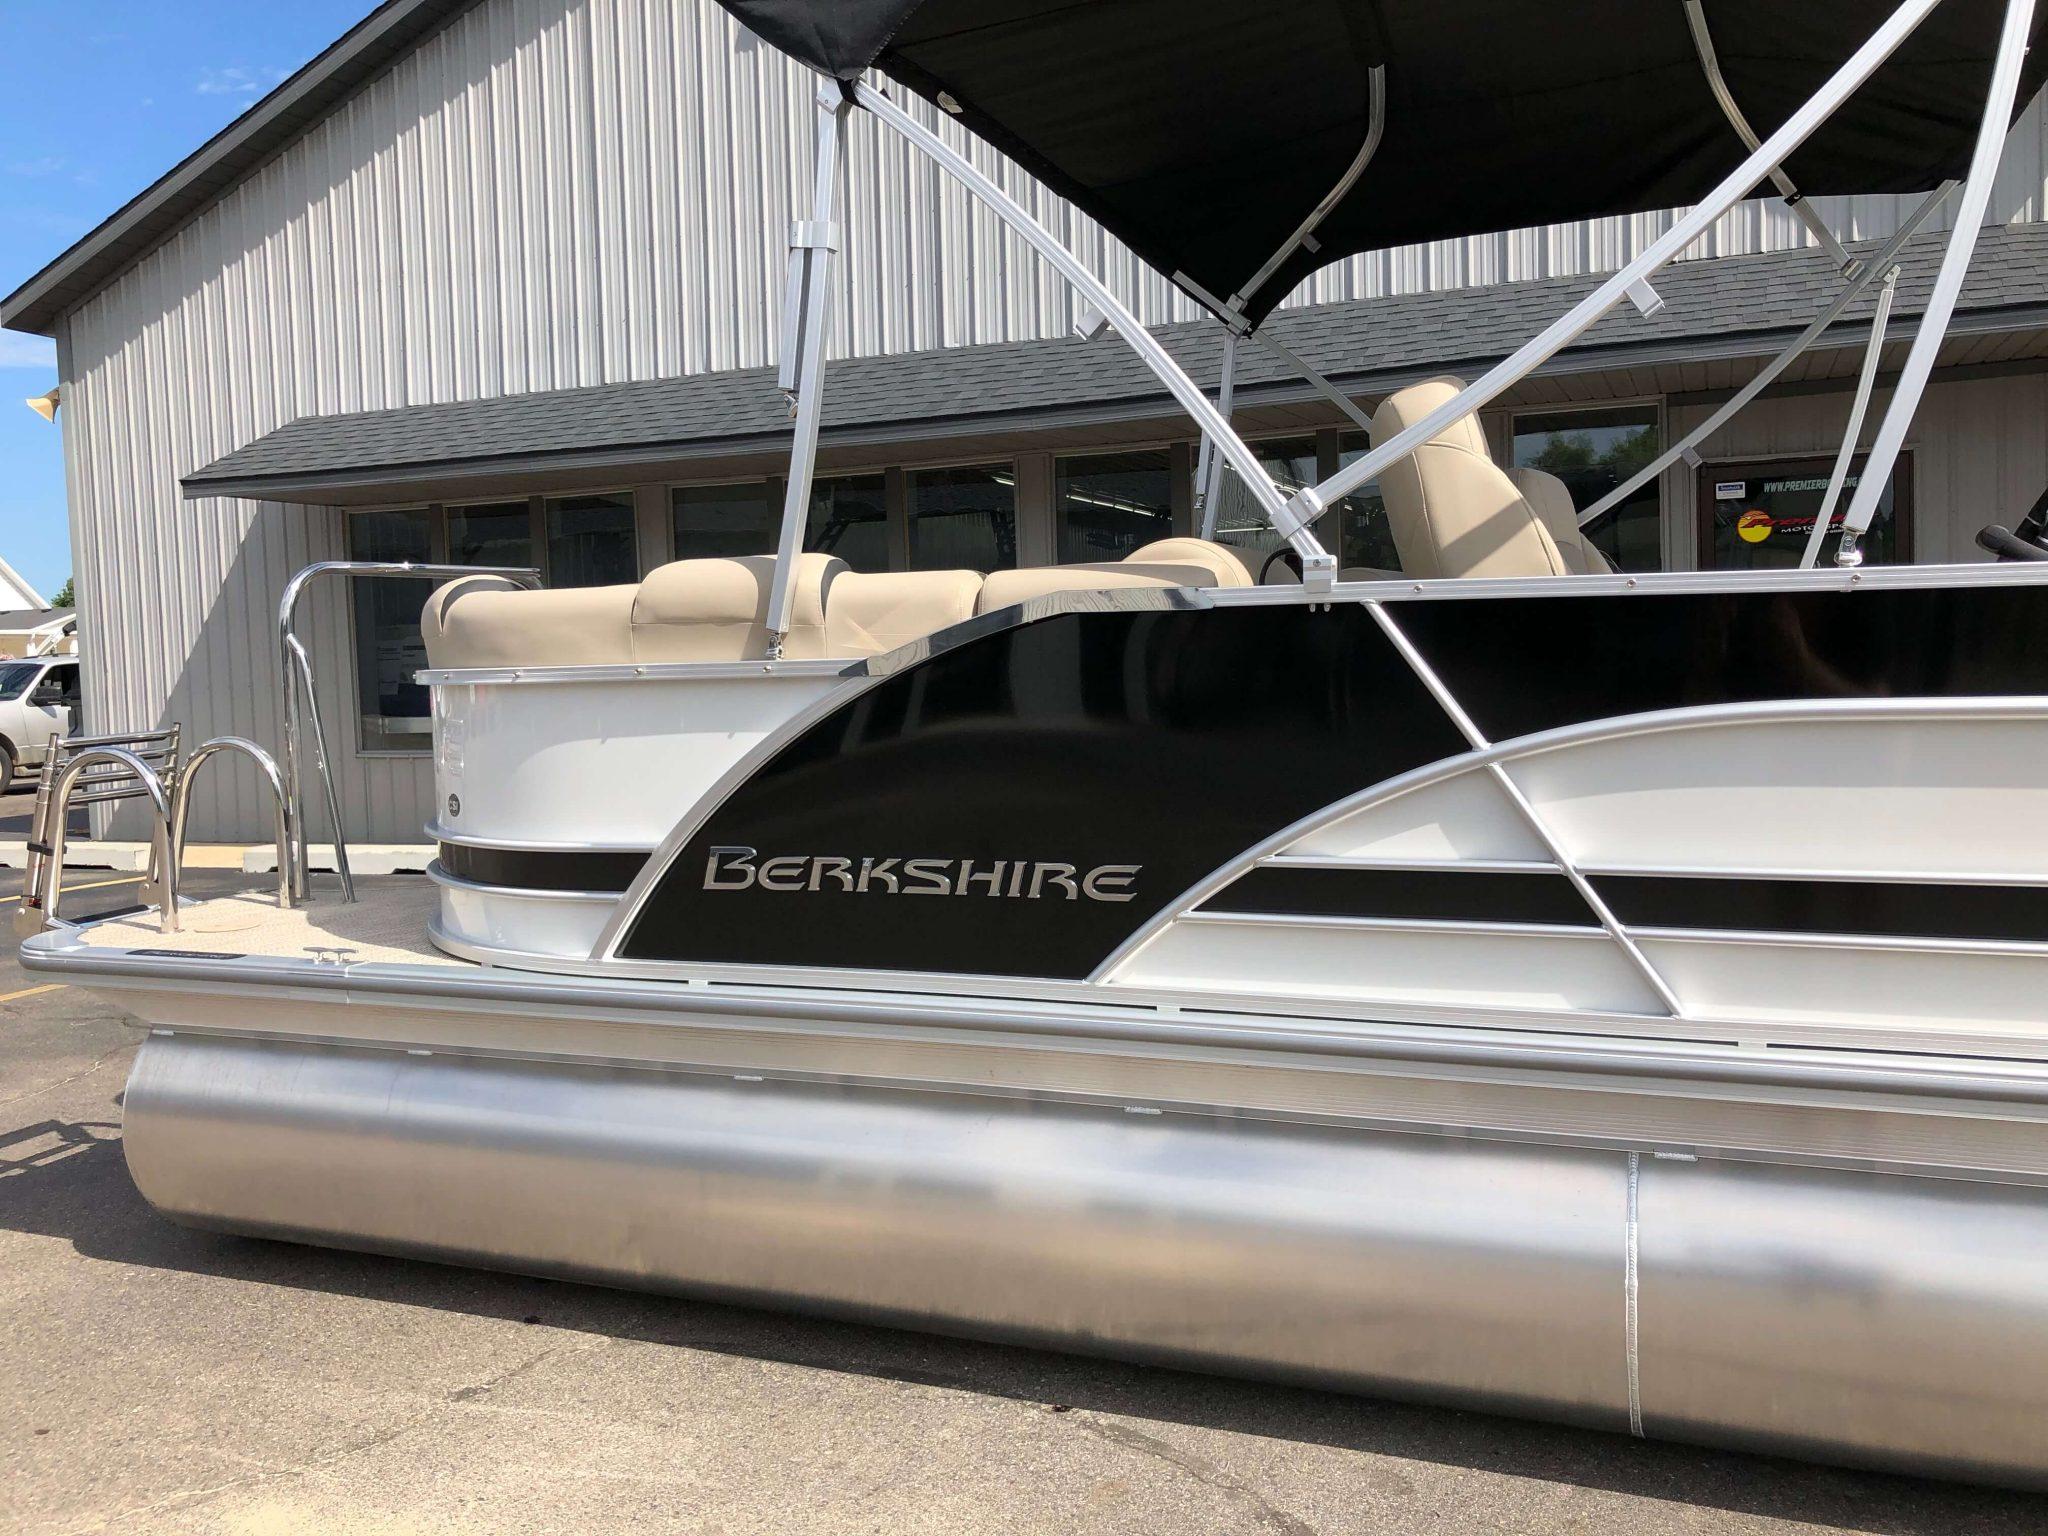 2019 Berkshire 23RFX STS Pontoon Boat 6